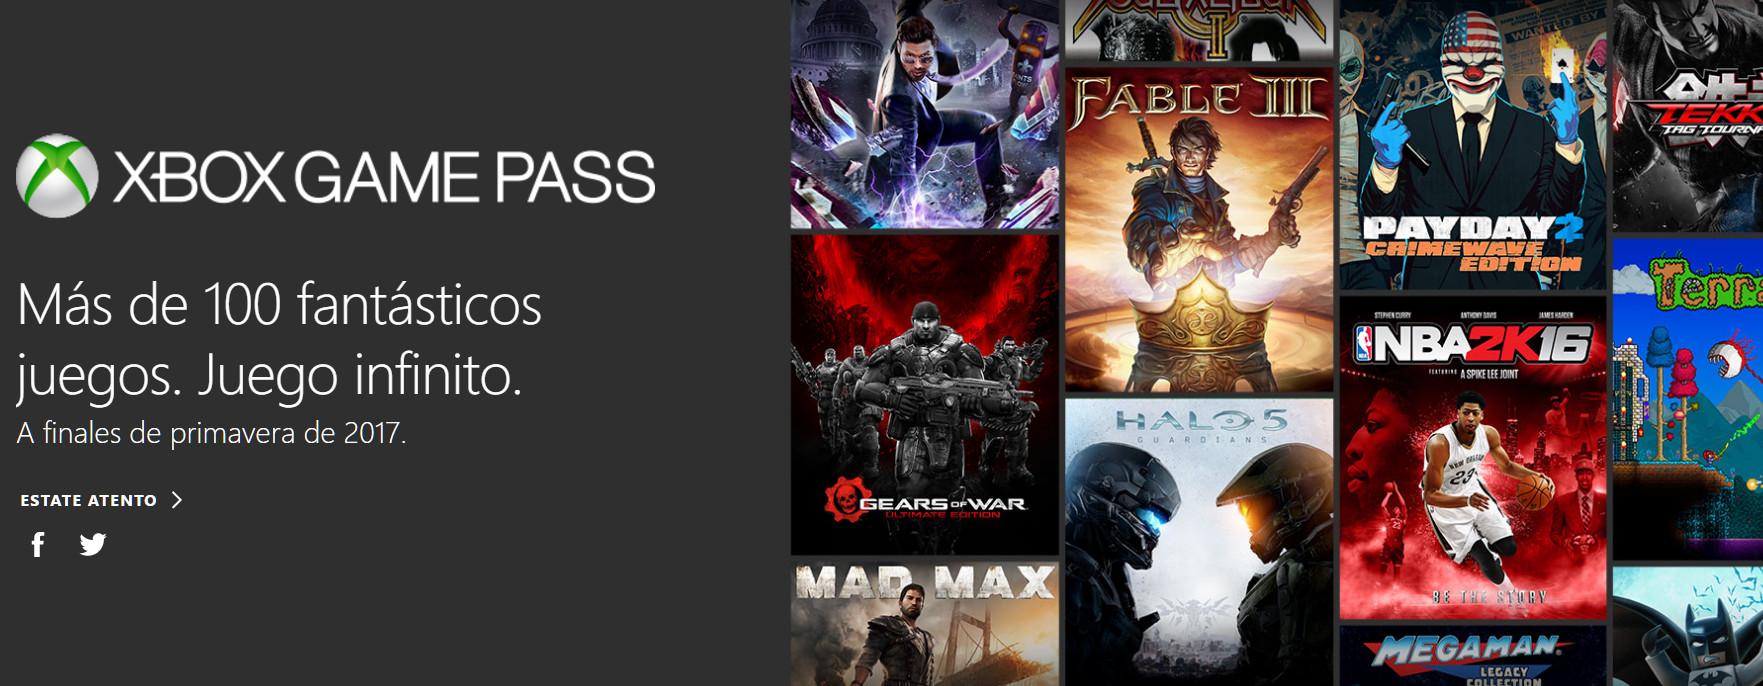 XboxGamePass_2